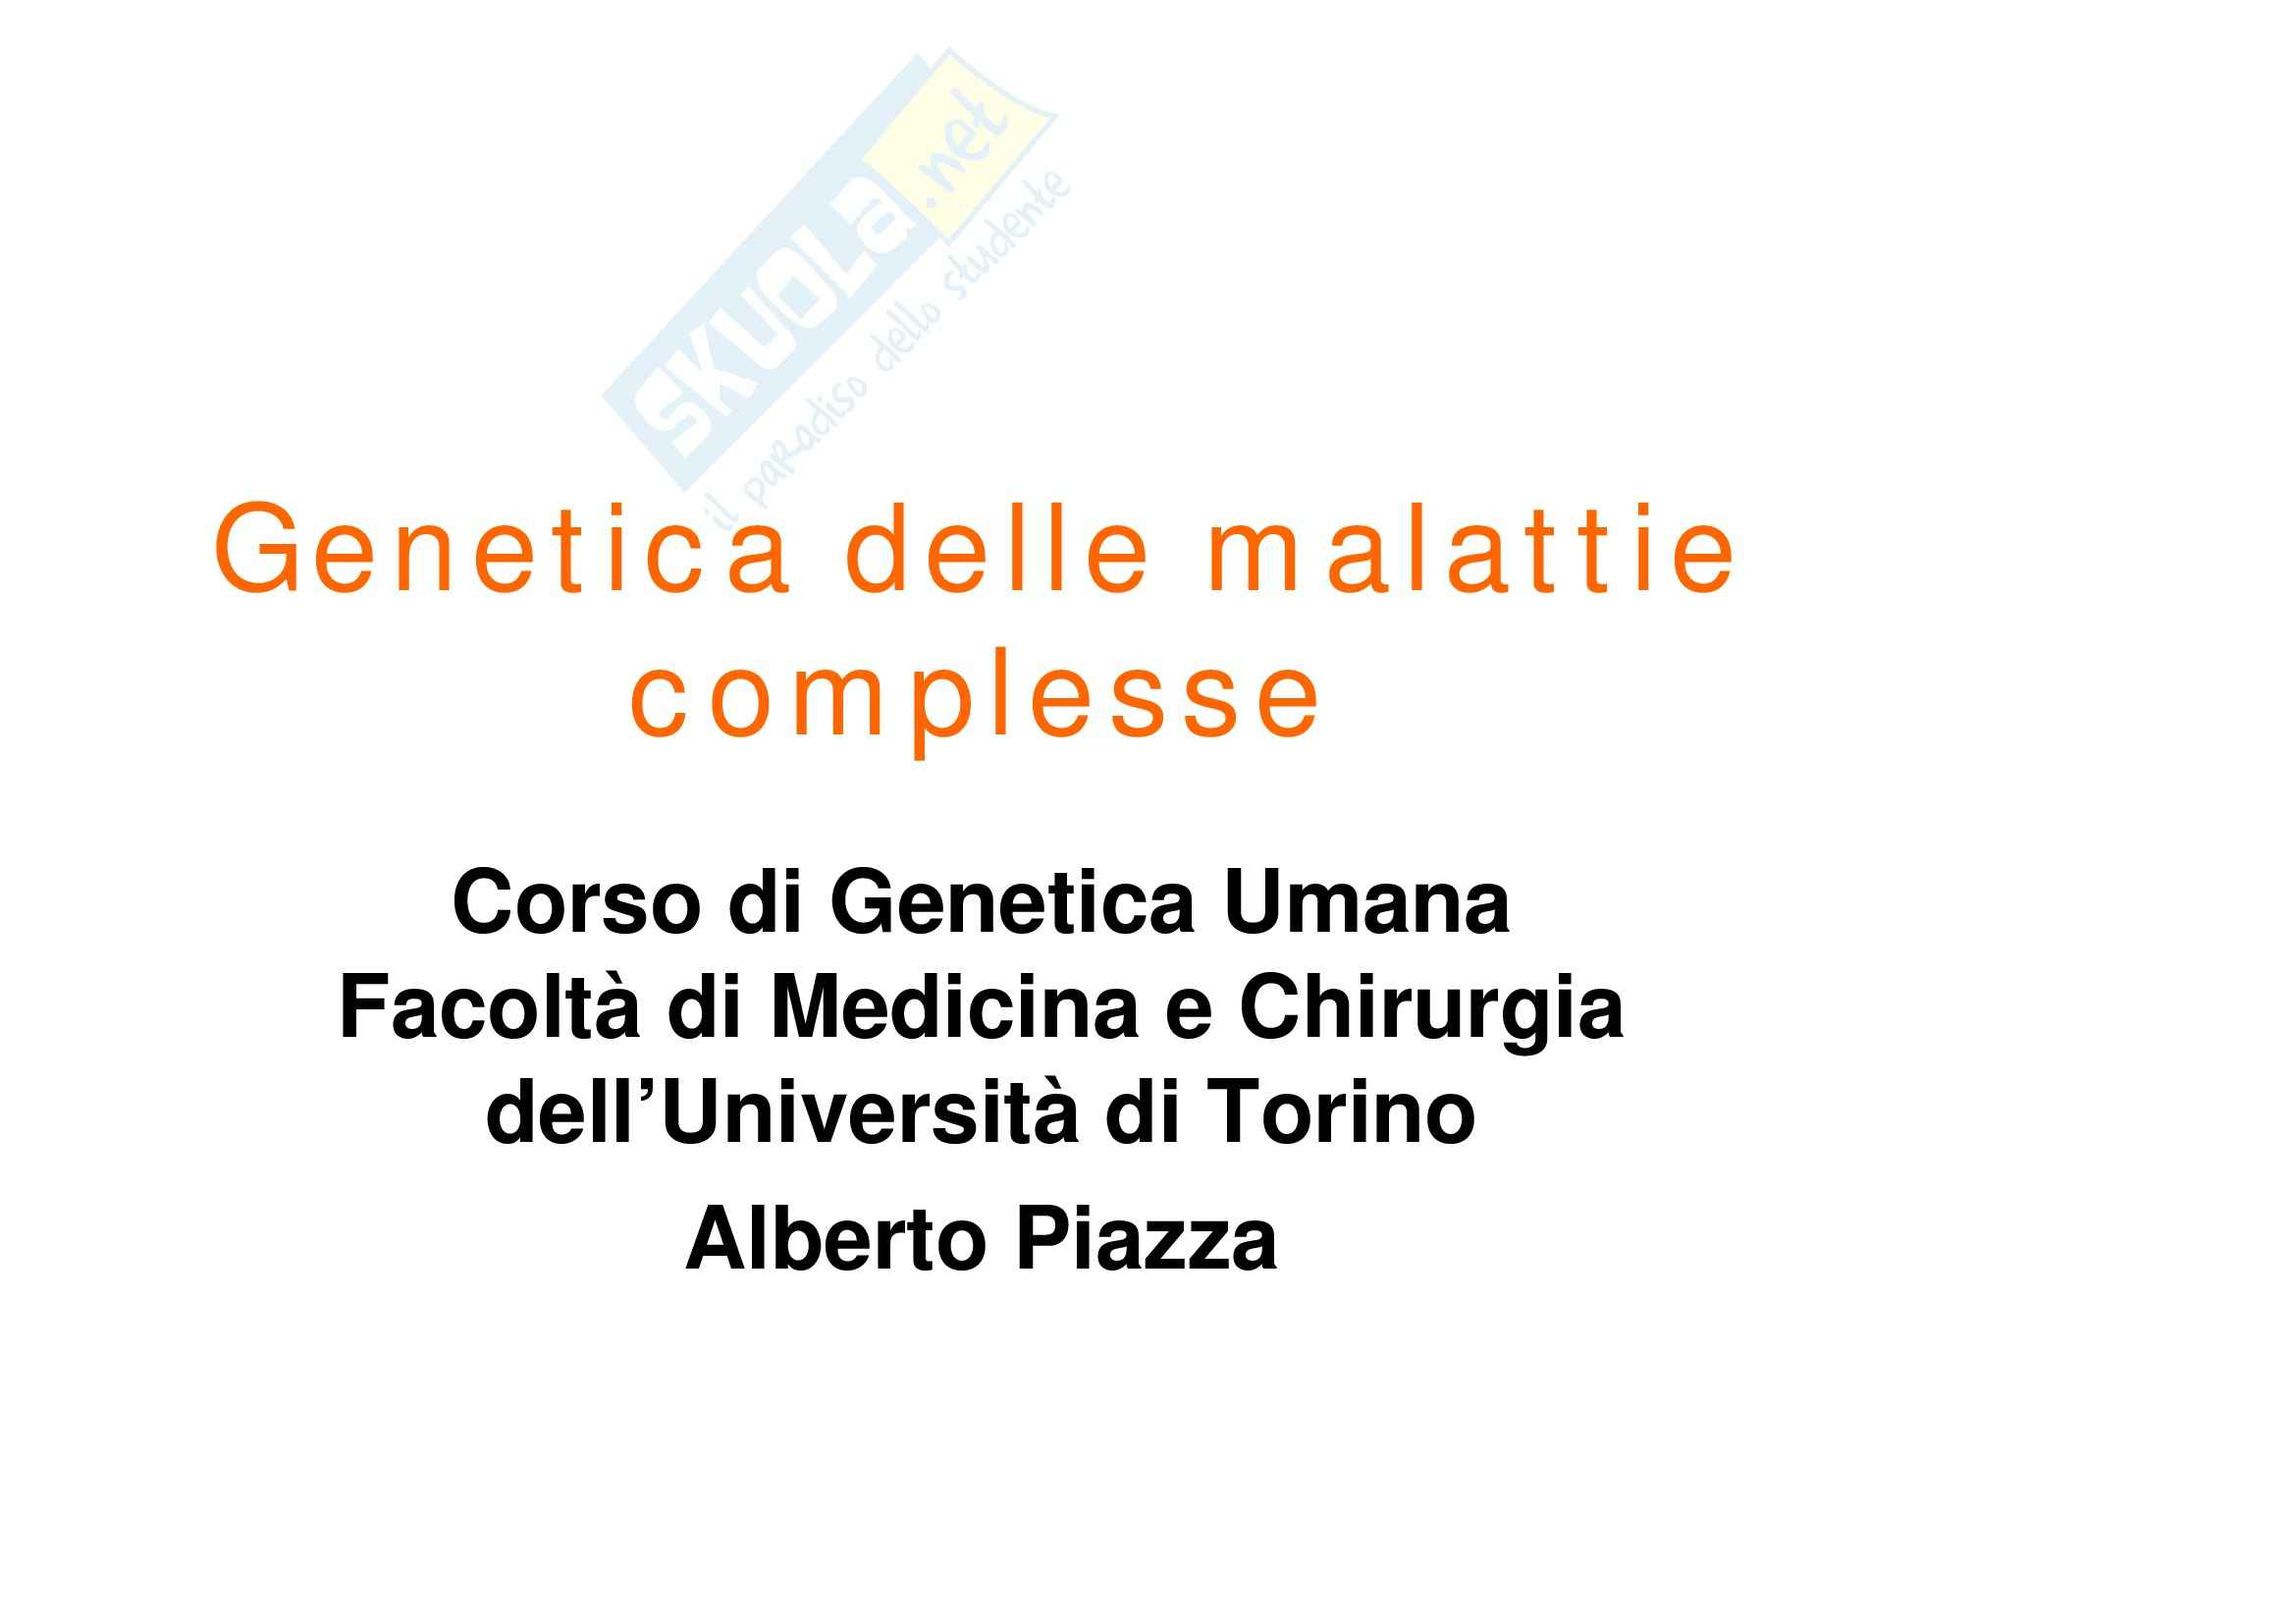 Genetica umana - genetica delle malattie complesse